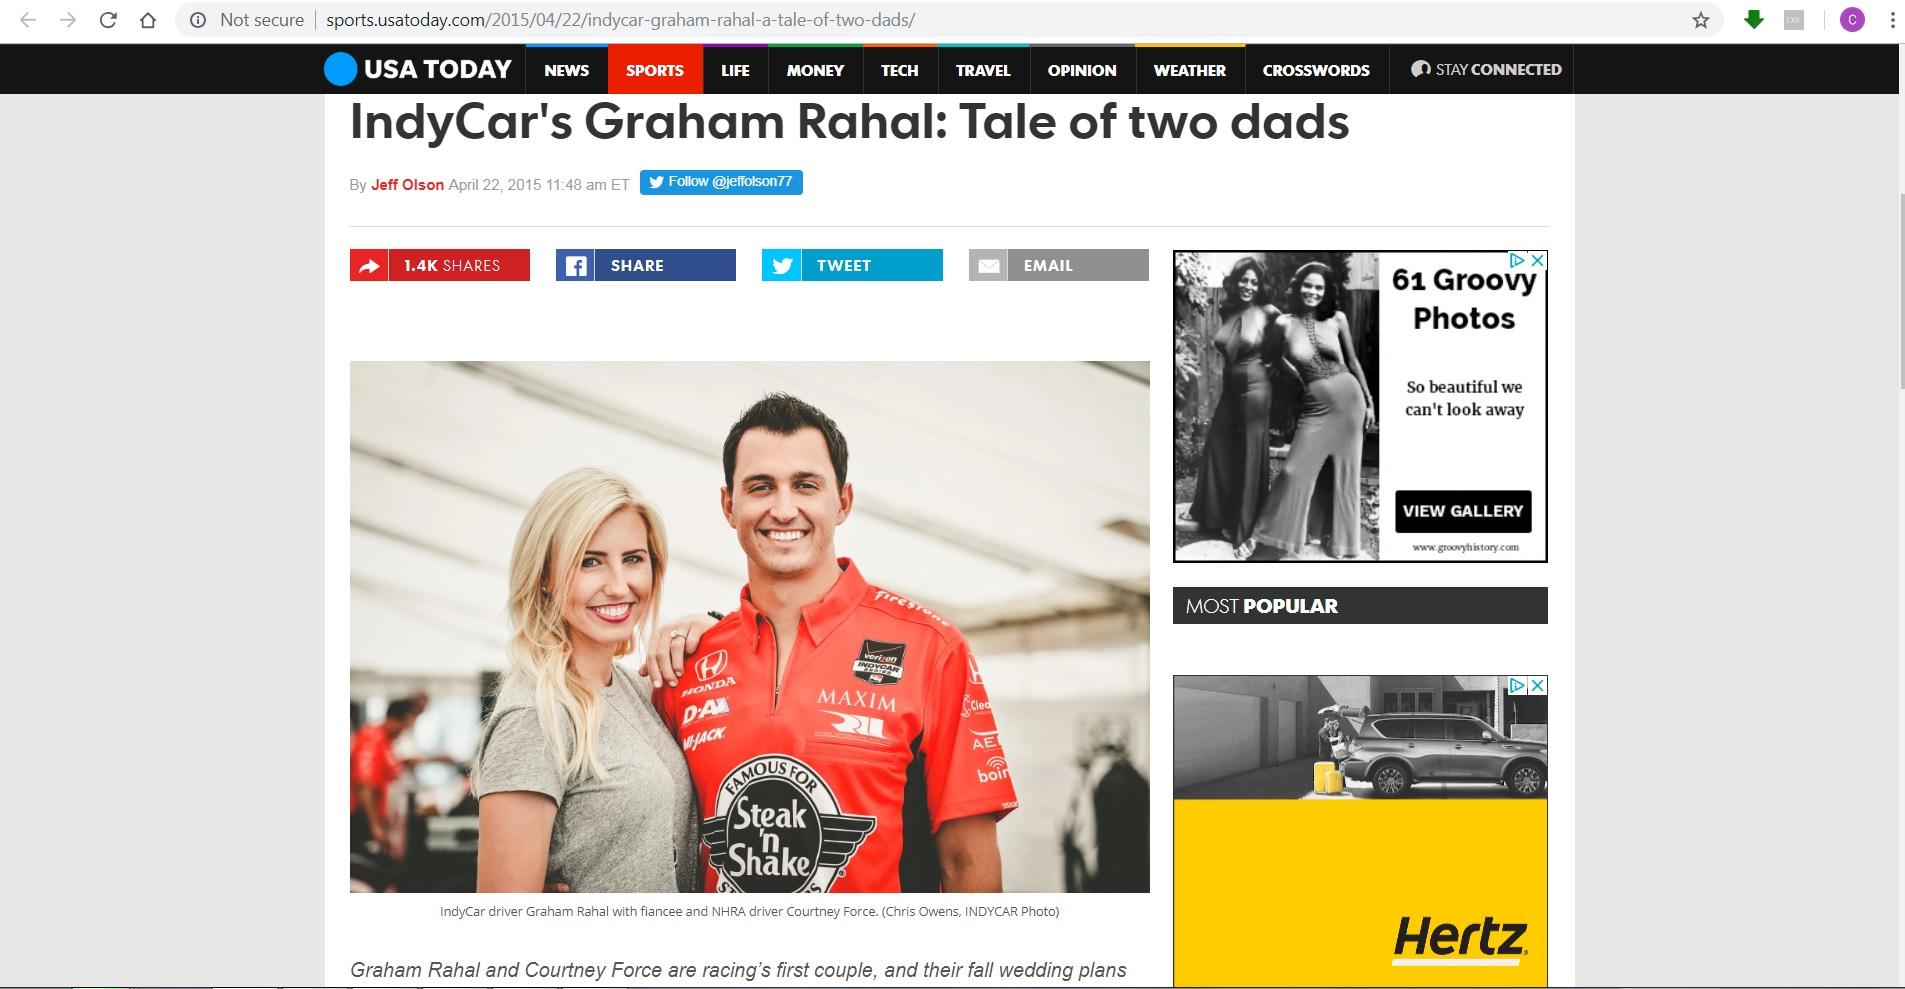 USA Today - Graham Rahal, Courtney Force